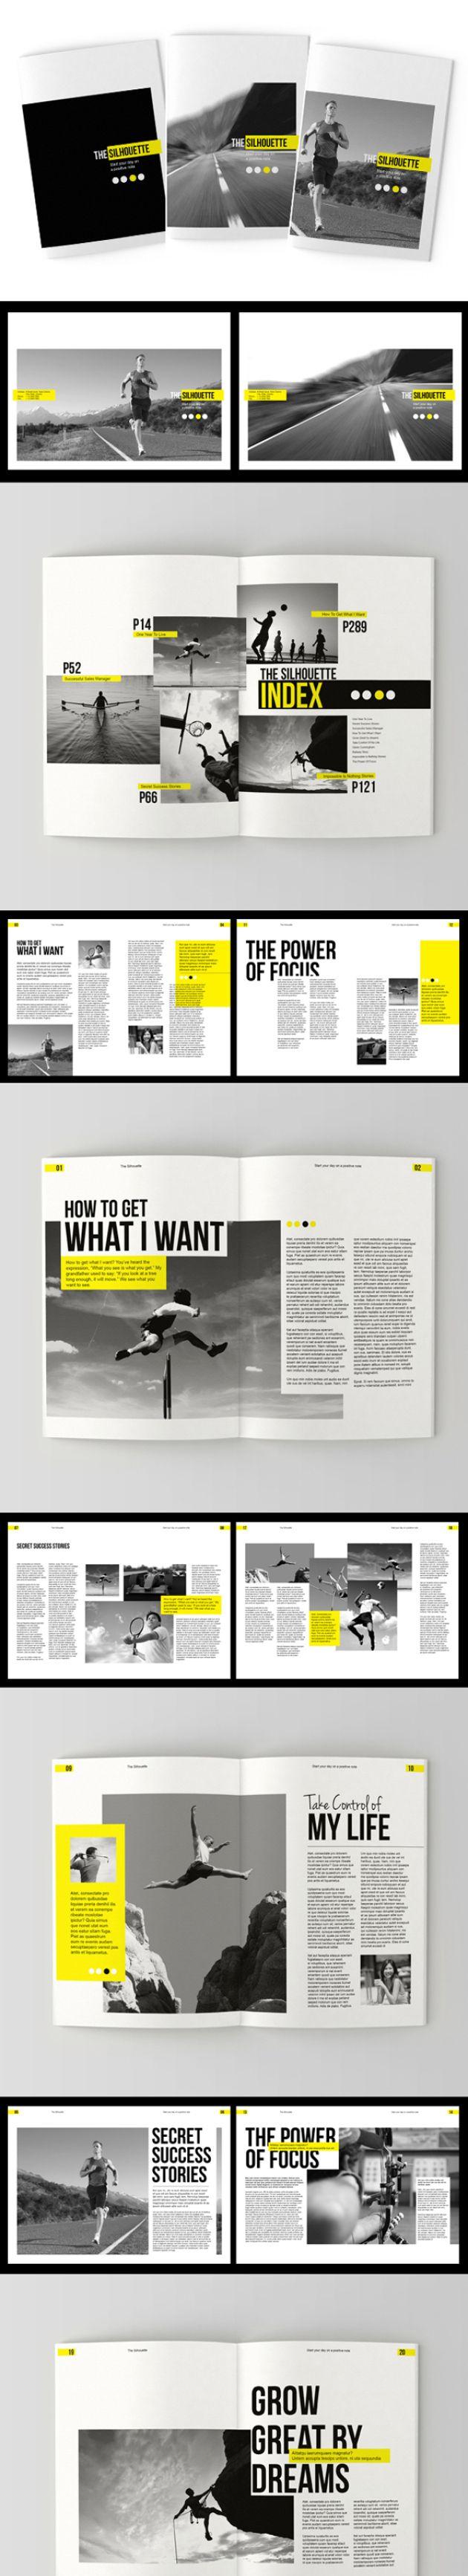 magazine layout design software free download